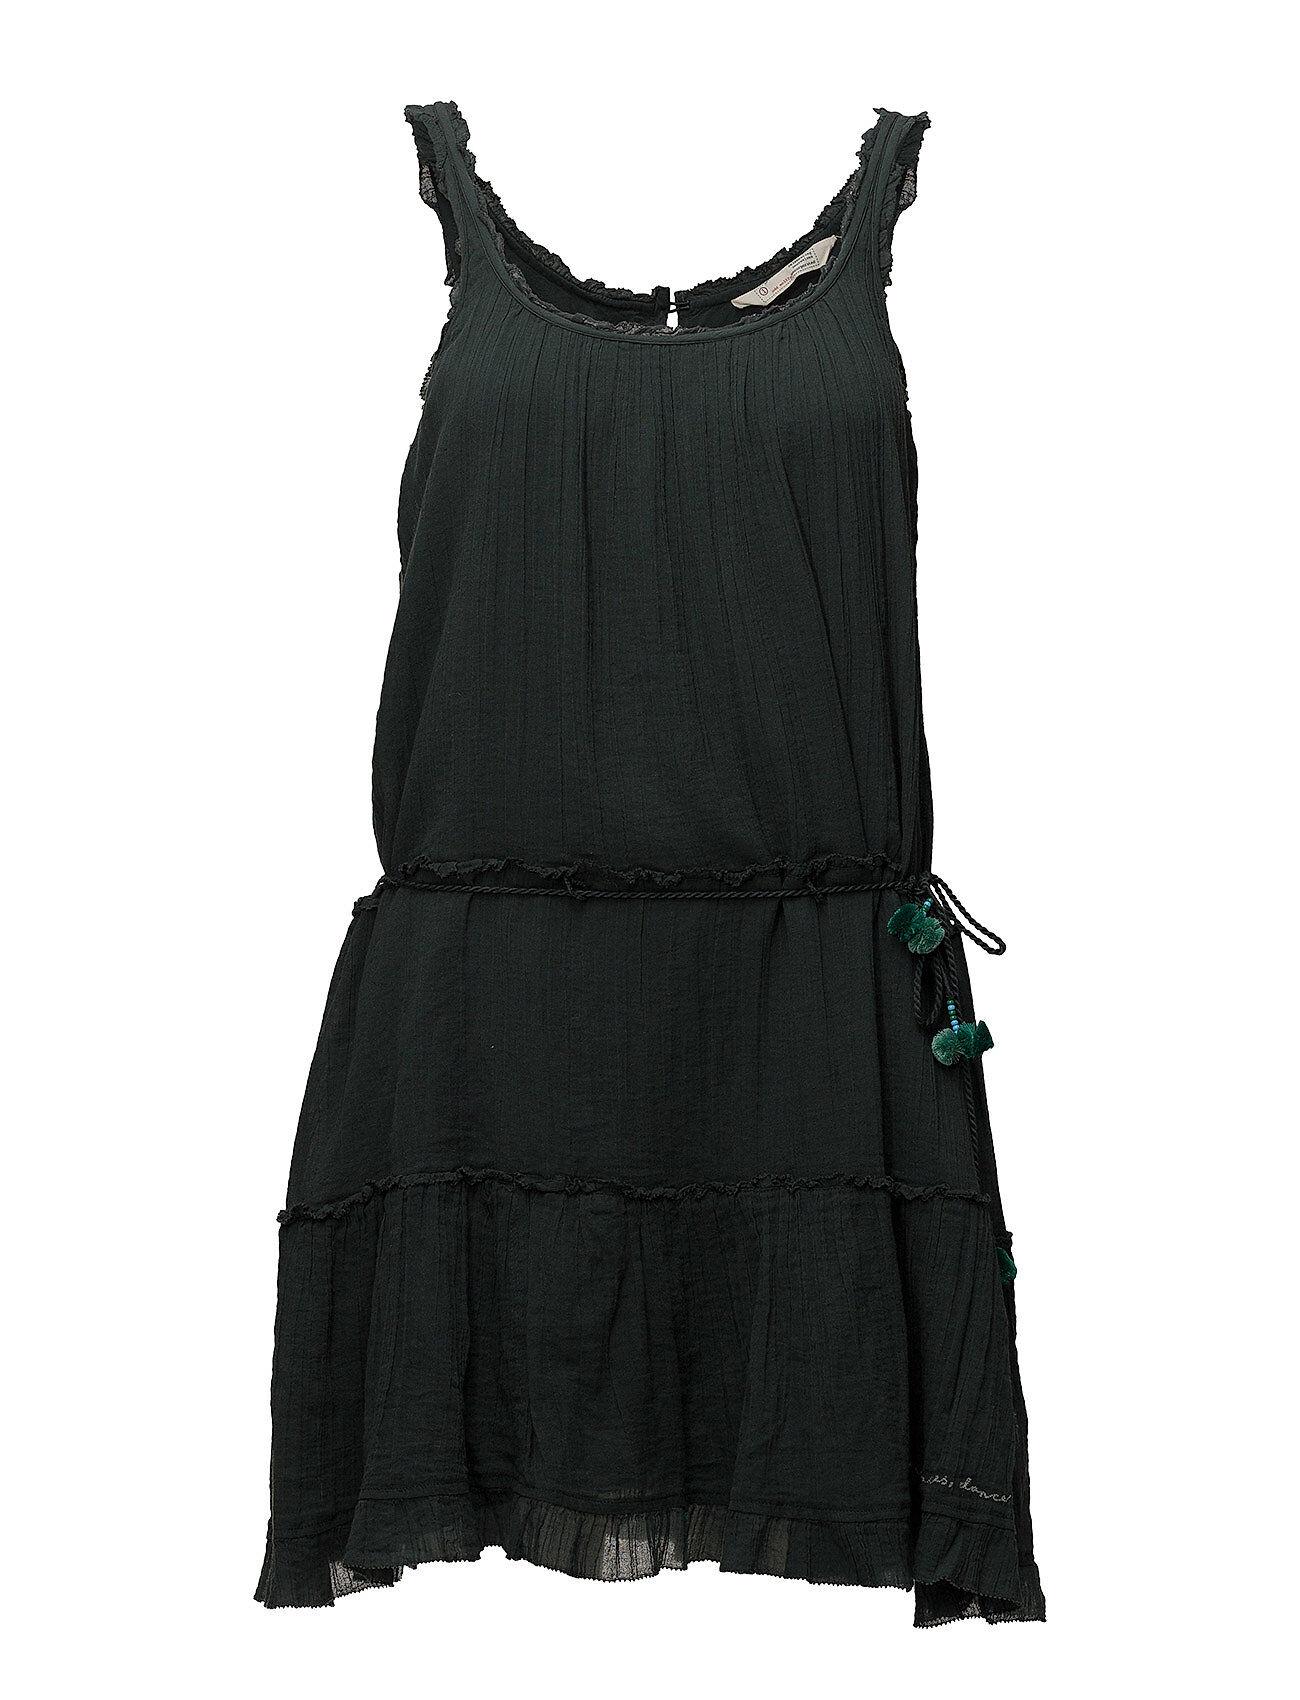 Image of ODD MOLLY Love Crush Dress Lyhyt Mekko Vihreä ODD MOLLY